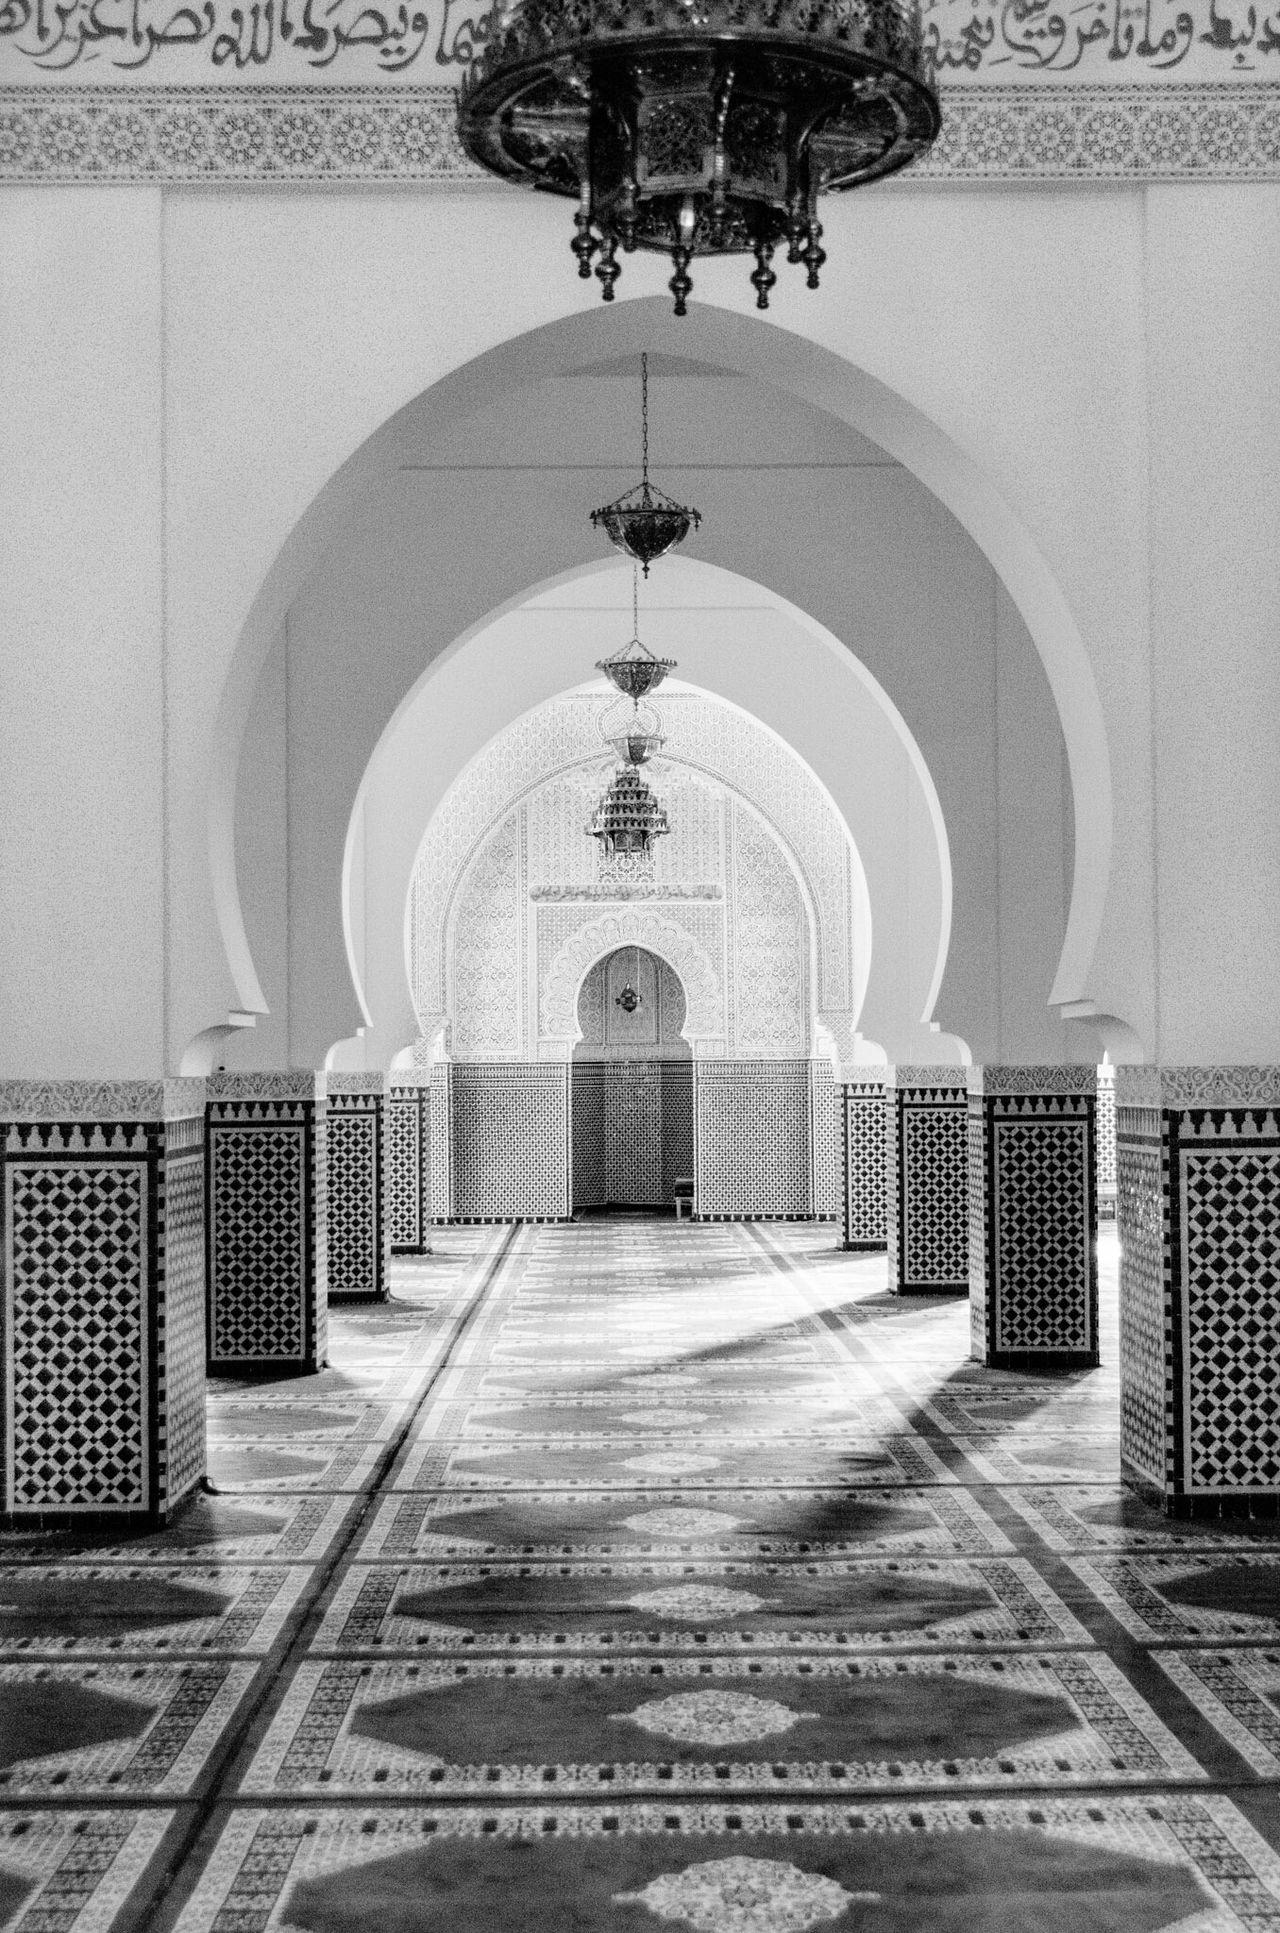 Architecture Marrakesh Morocco Art Religion Muslim Built Structure Diminishing Perspective Perspective Black & White Travel Travel Destinations Tourism